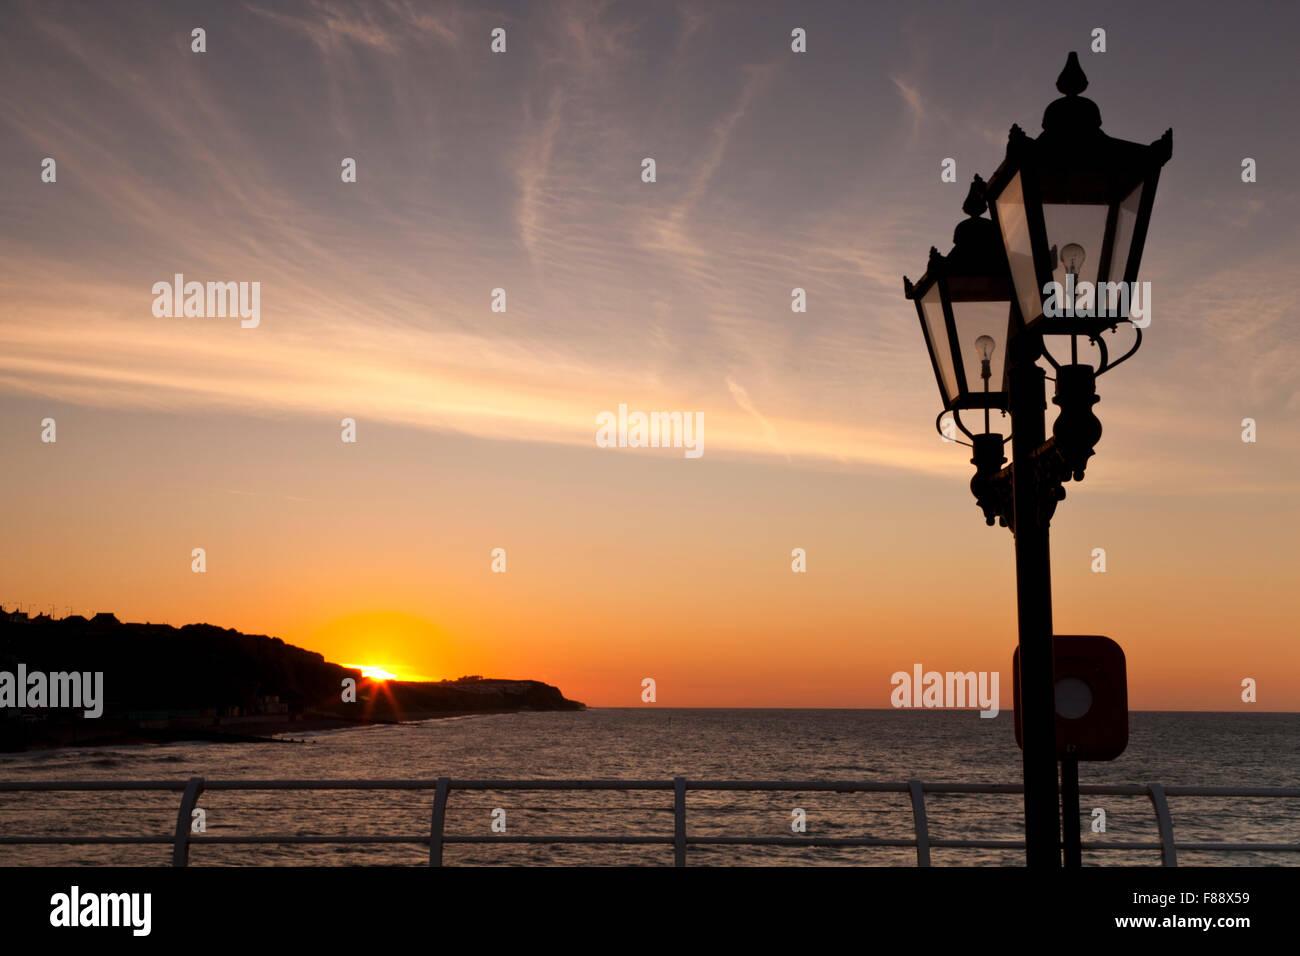 Sunset over Cromer Cliffs, Norfolk England UK, from Cromer Pier - Stock Image